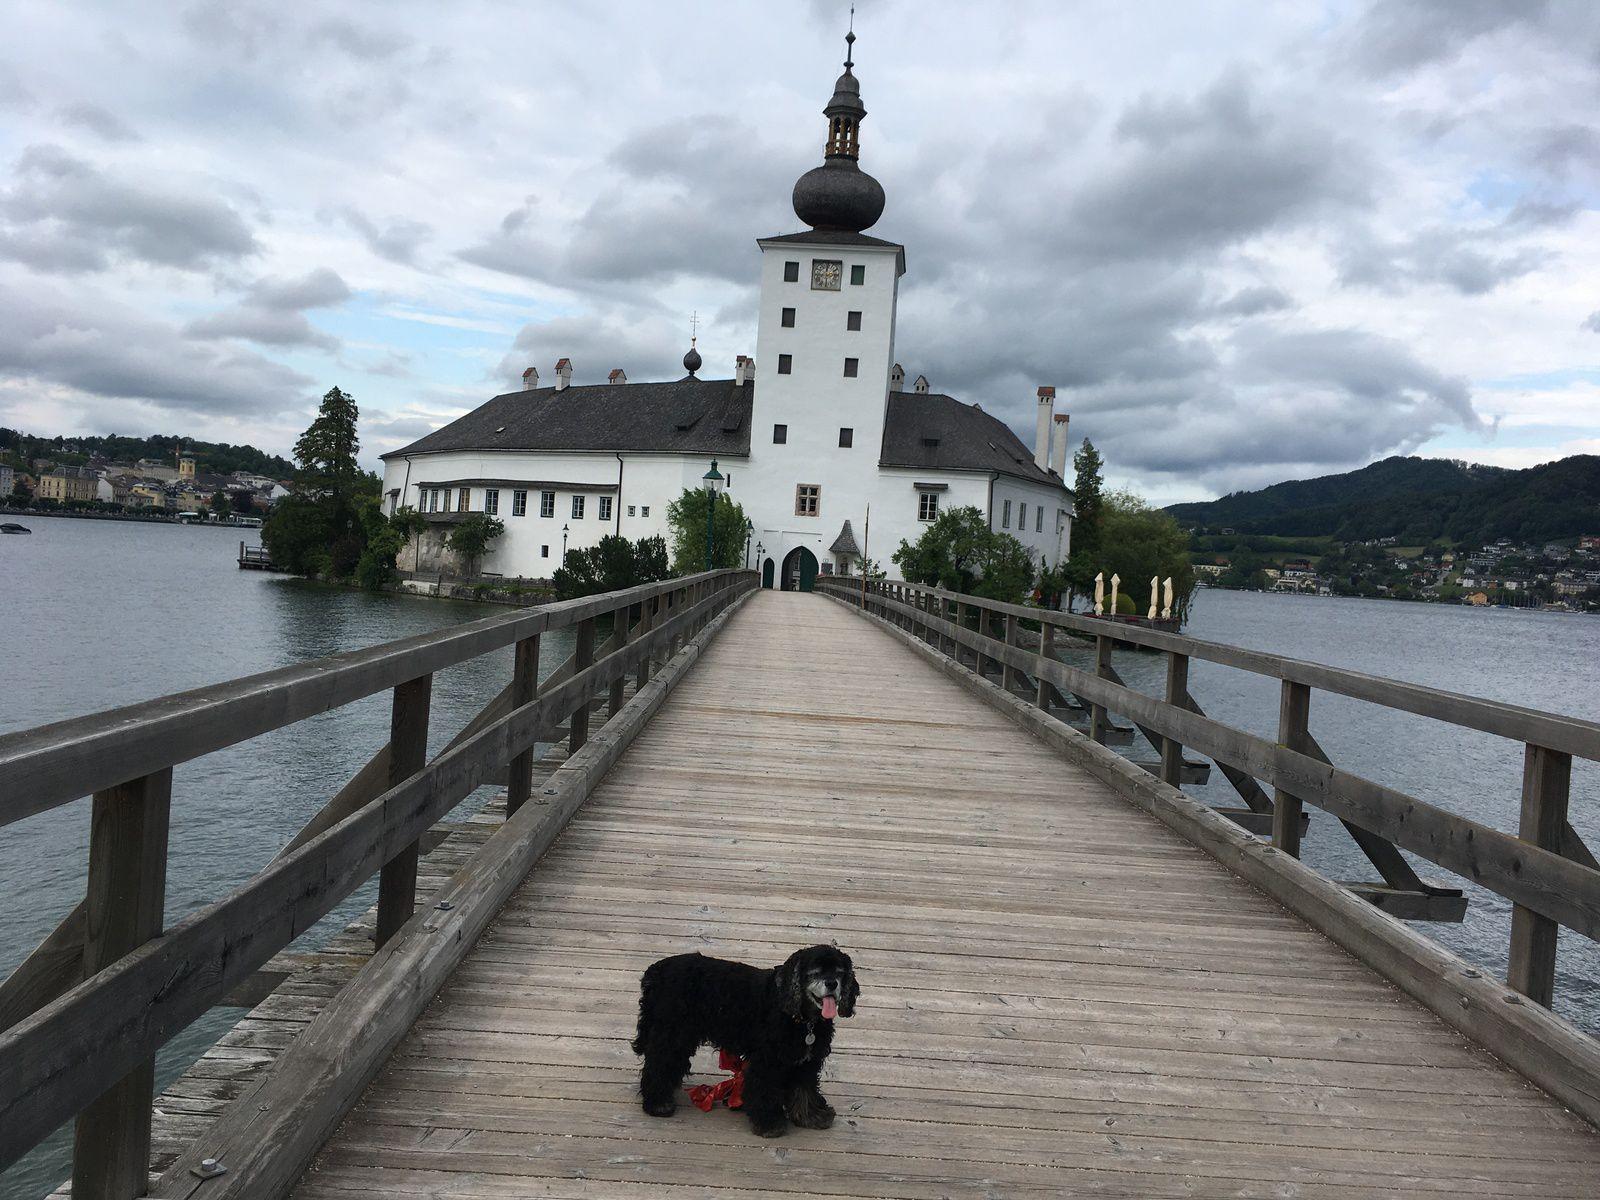 19 juin 2020 : Mondsee / Attersee / Traunsee (Autriche)